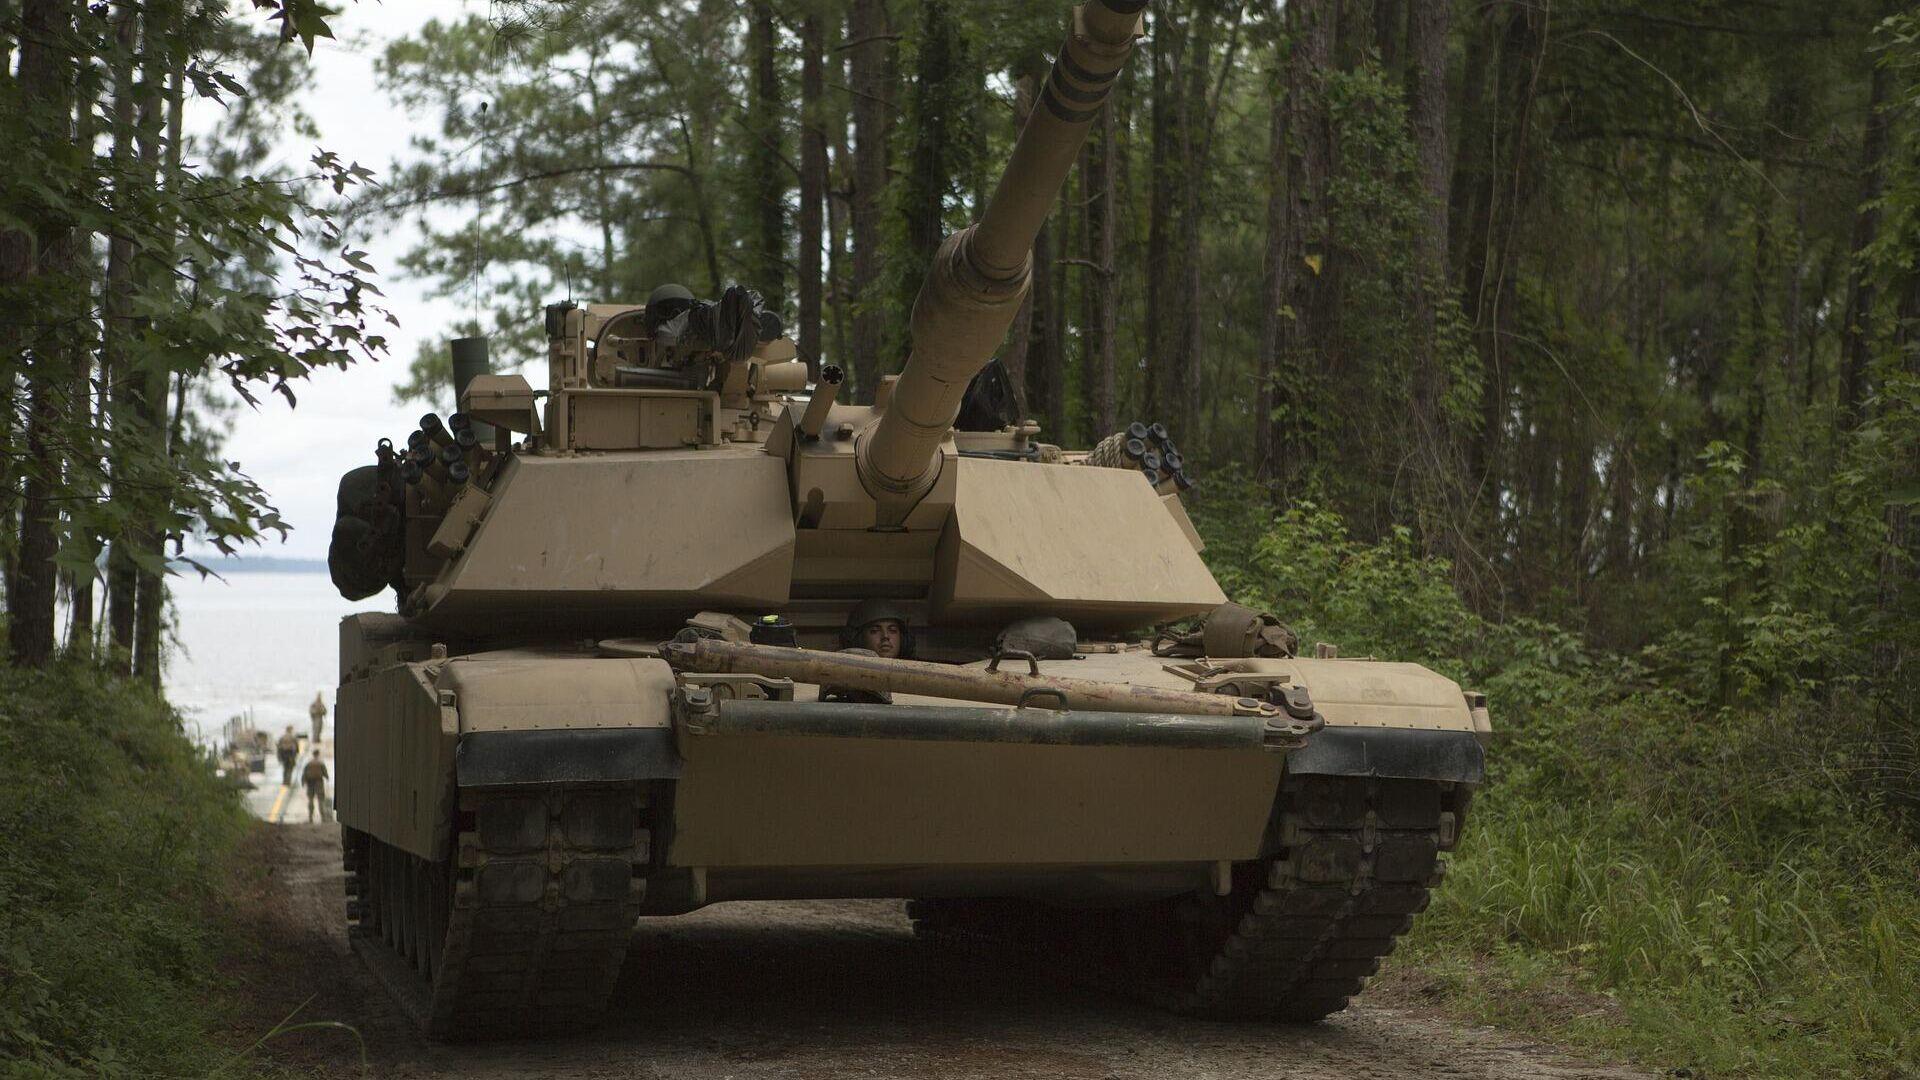 Abrams-Panzer. Symbolbild - SNA, 1920, 28.09.2021